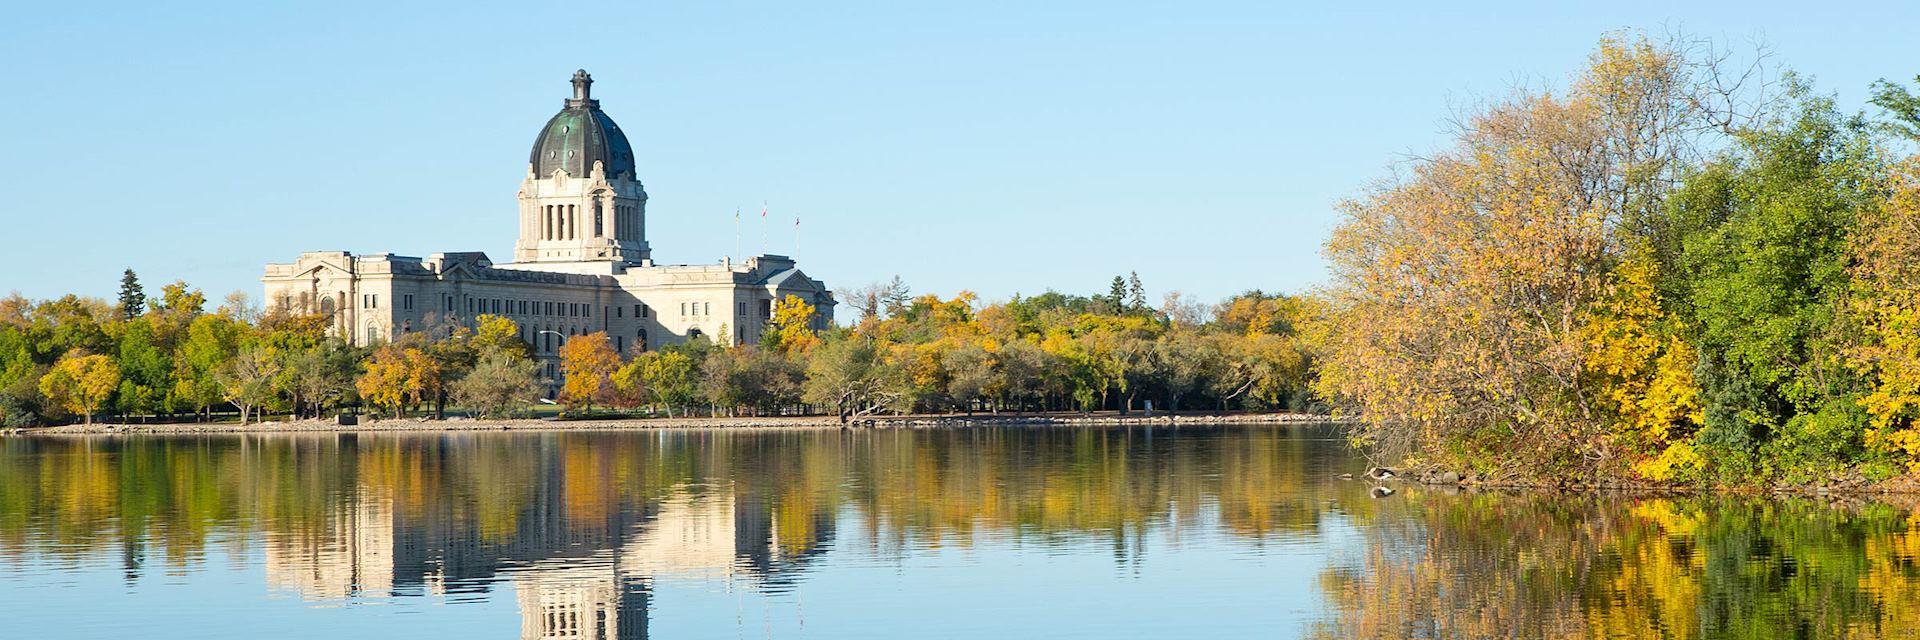 Saskatchewan Legislative Building